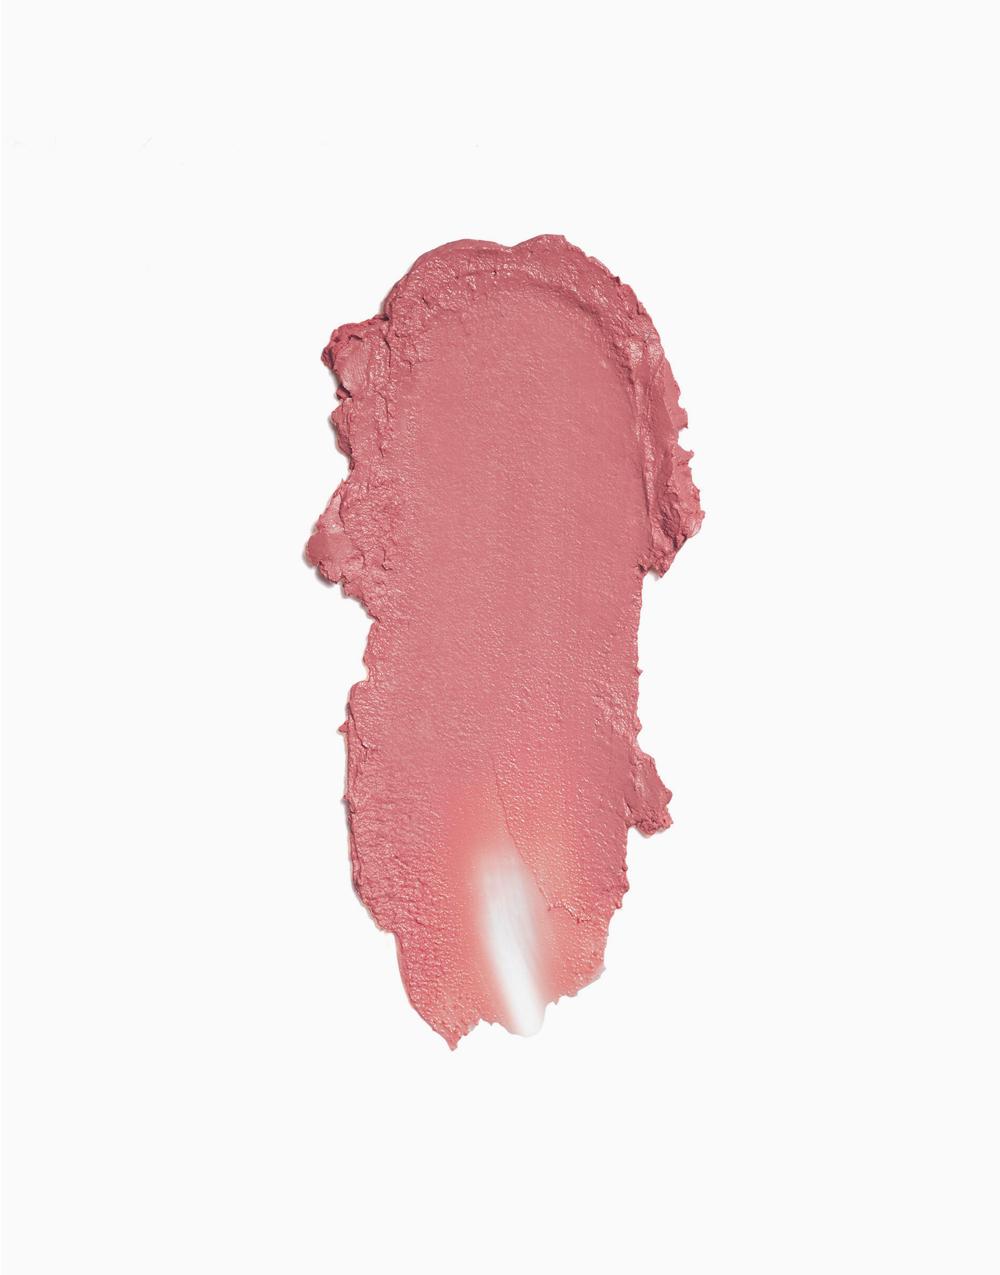 Exhibitionist Cream Lipstick by CoverGirl   Sultry Sienna